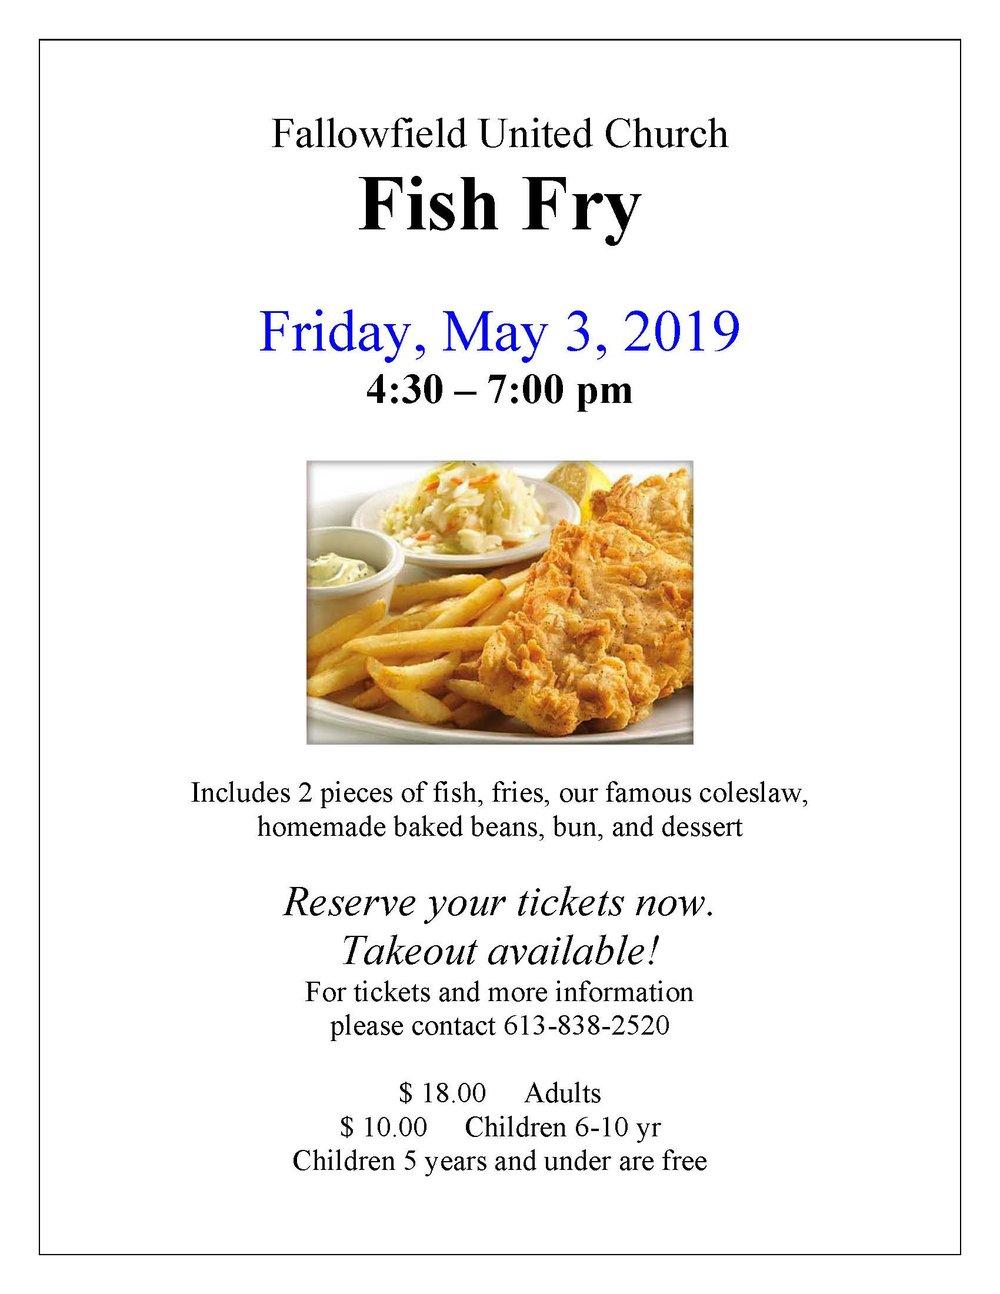 fish fry  supper ad 2019.jpg